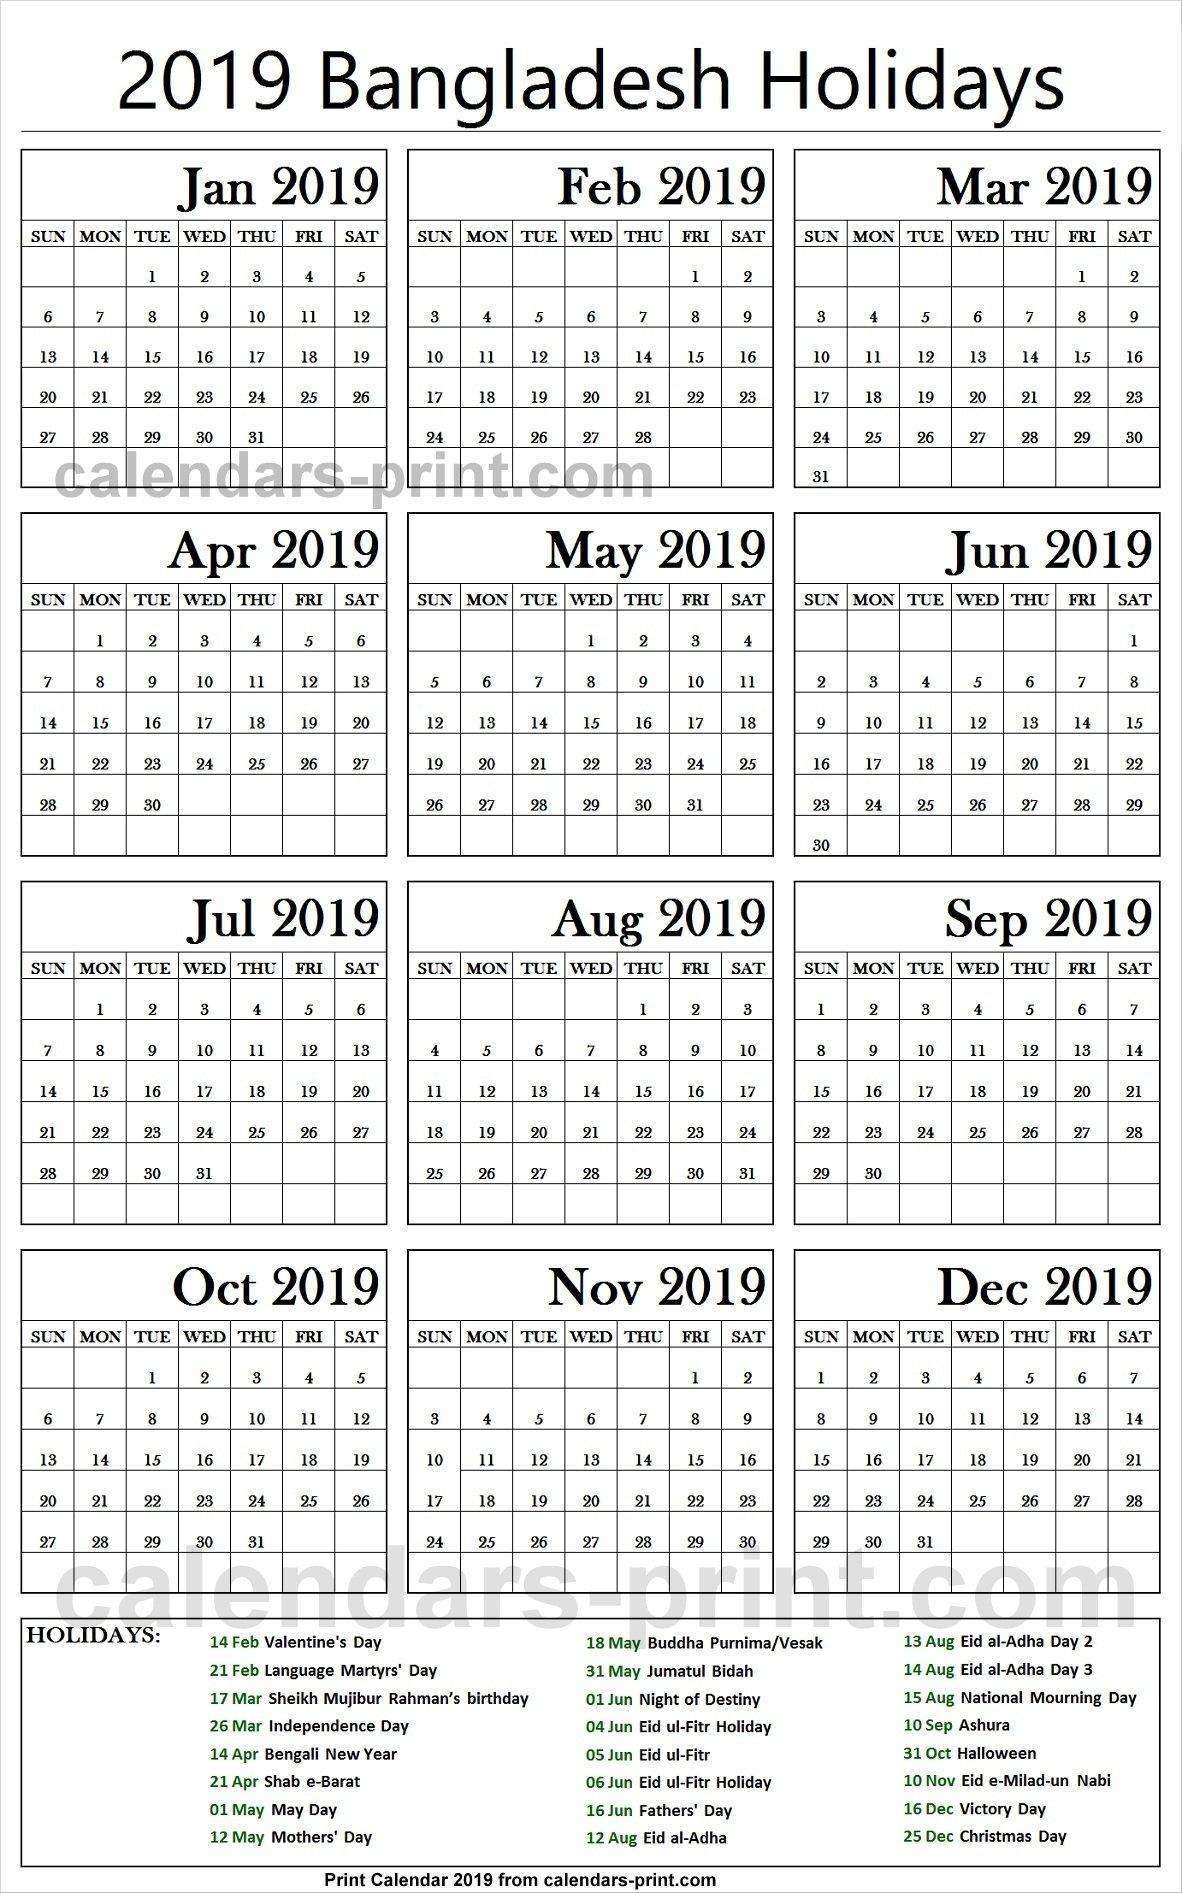 2019 Bank Holidays Bangladesh Calendar | 2019 Bangladesh Calendar Calendar Of 2019 With Holidays In Bangladesh